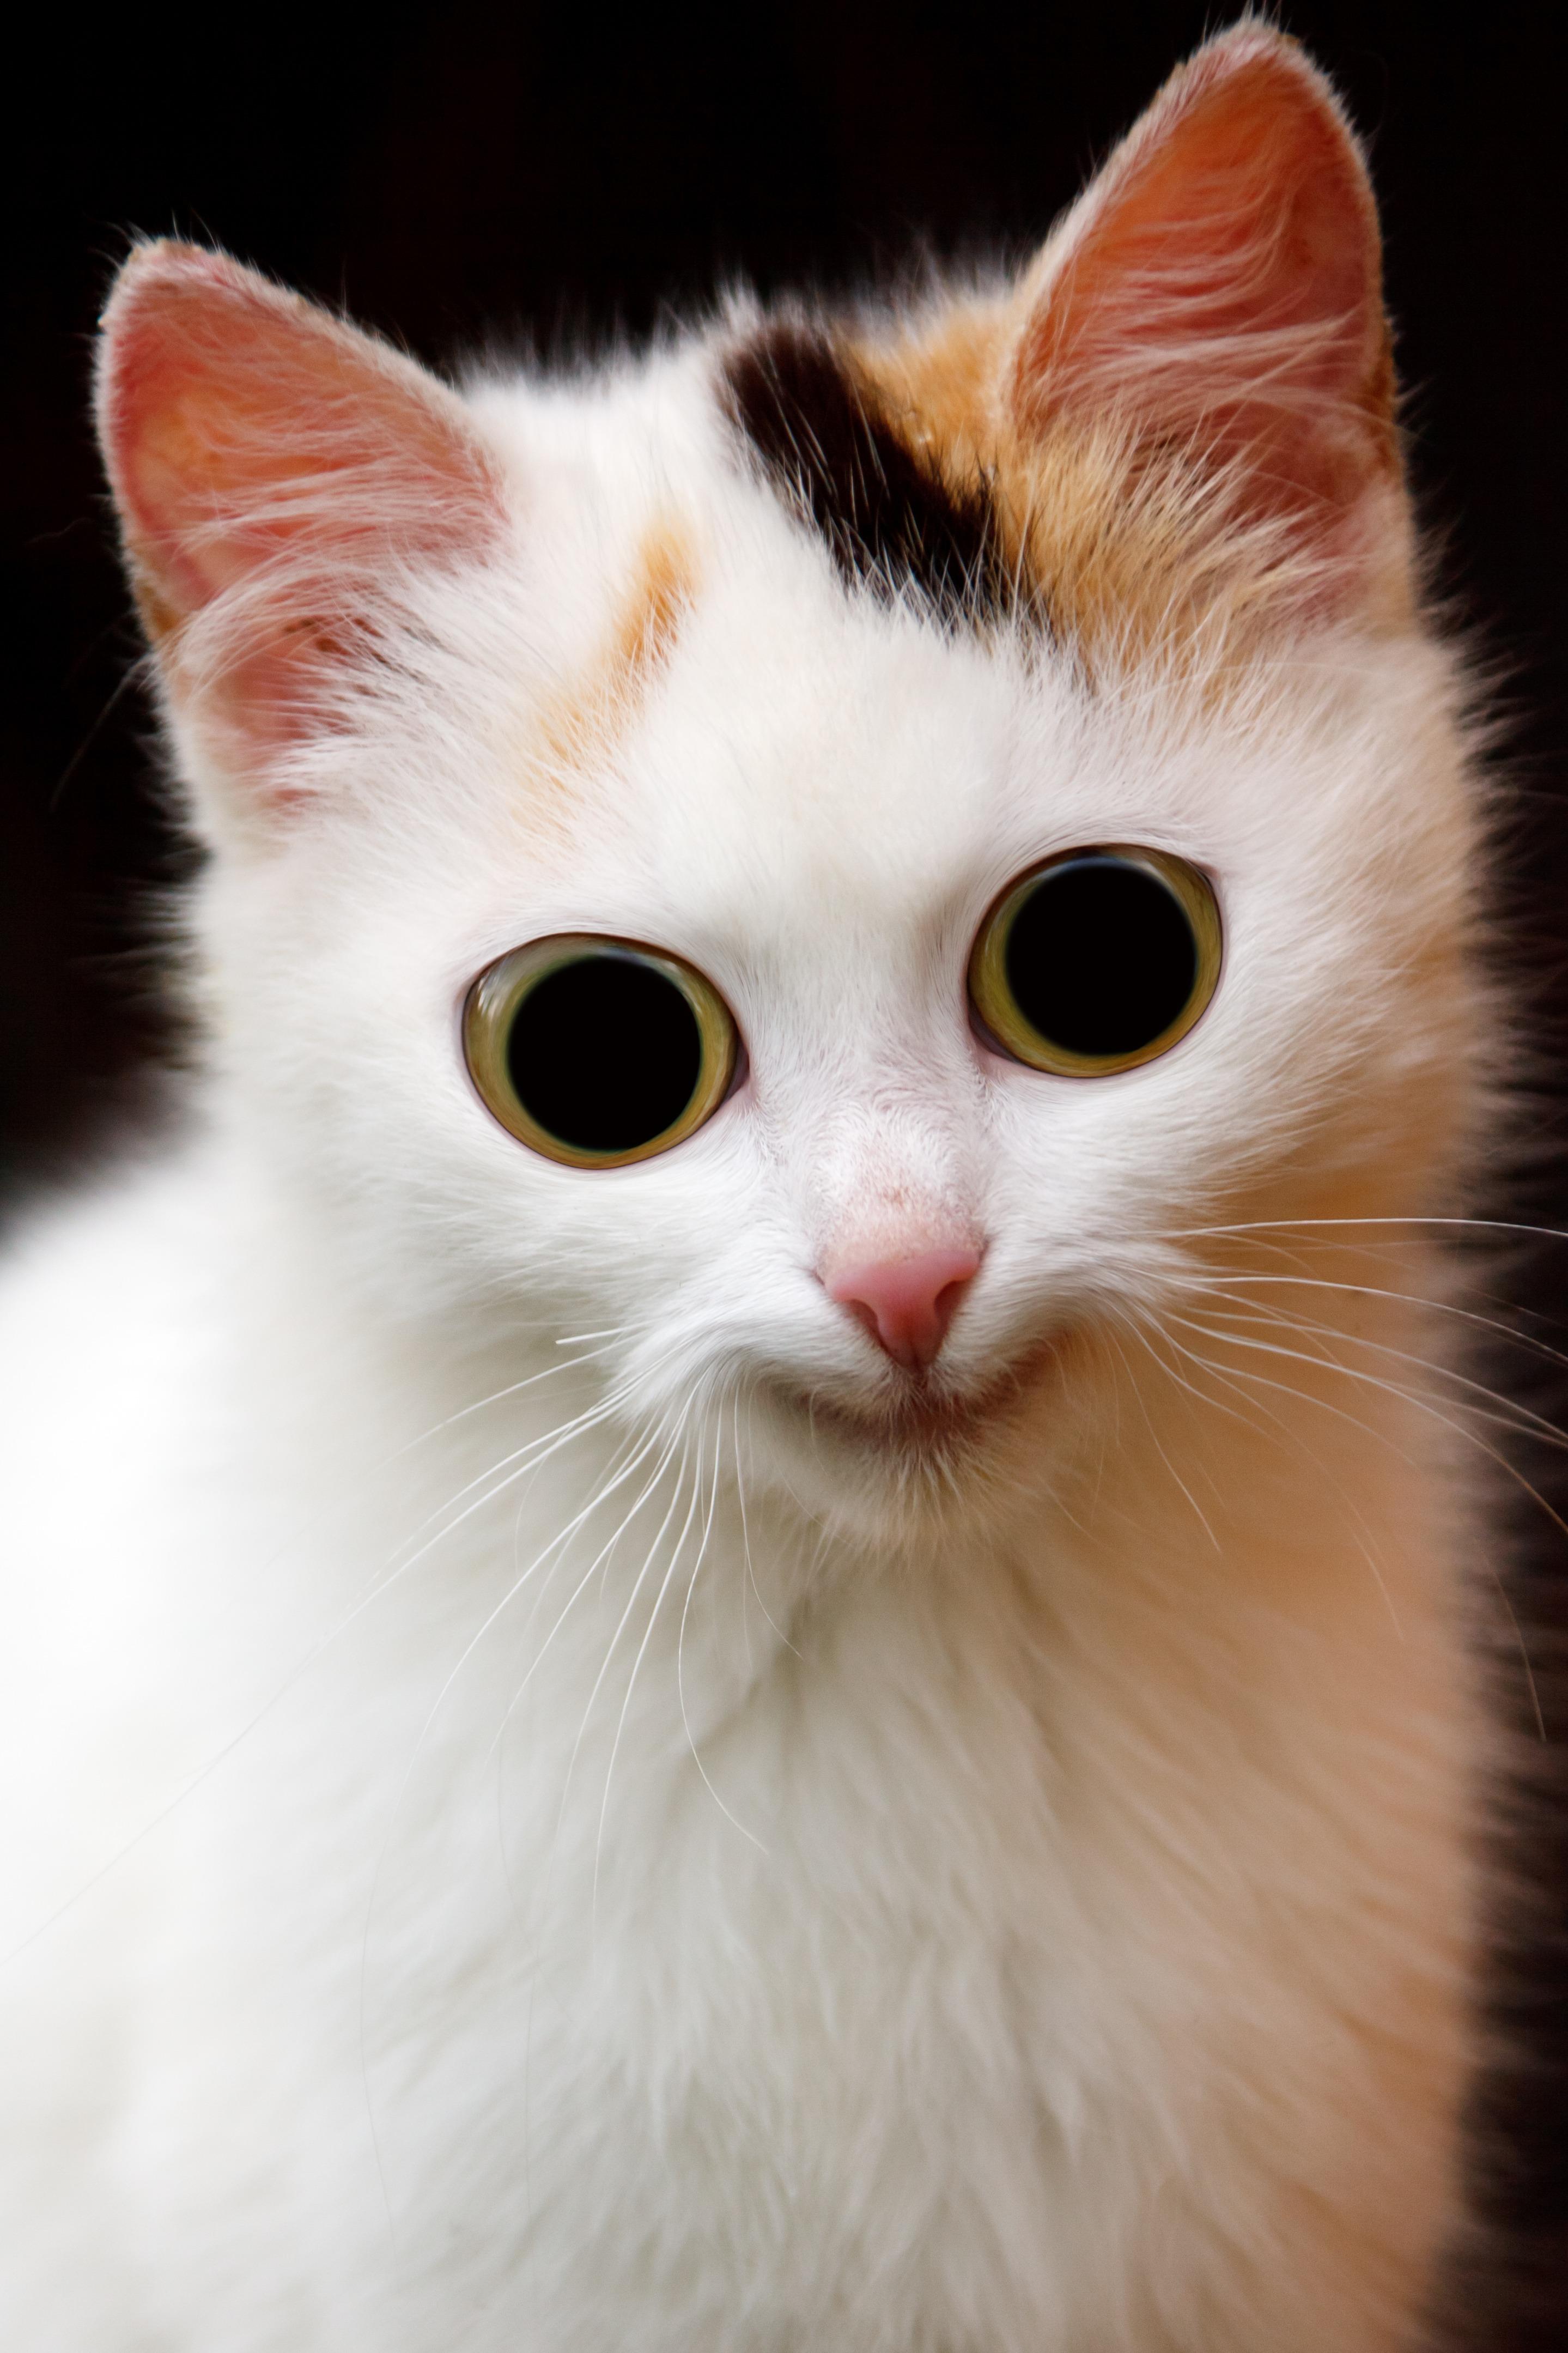 Download 95+  Gambar Kucing Aneh Paling Baru